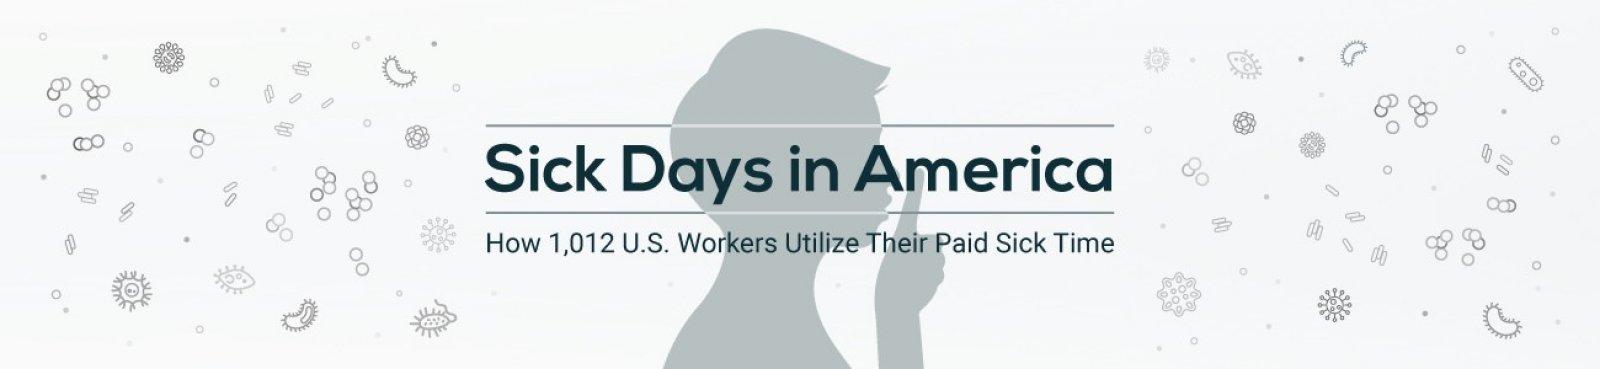 Sick Days In America image